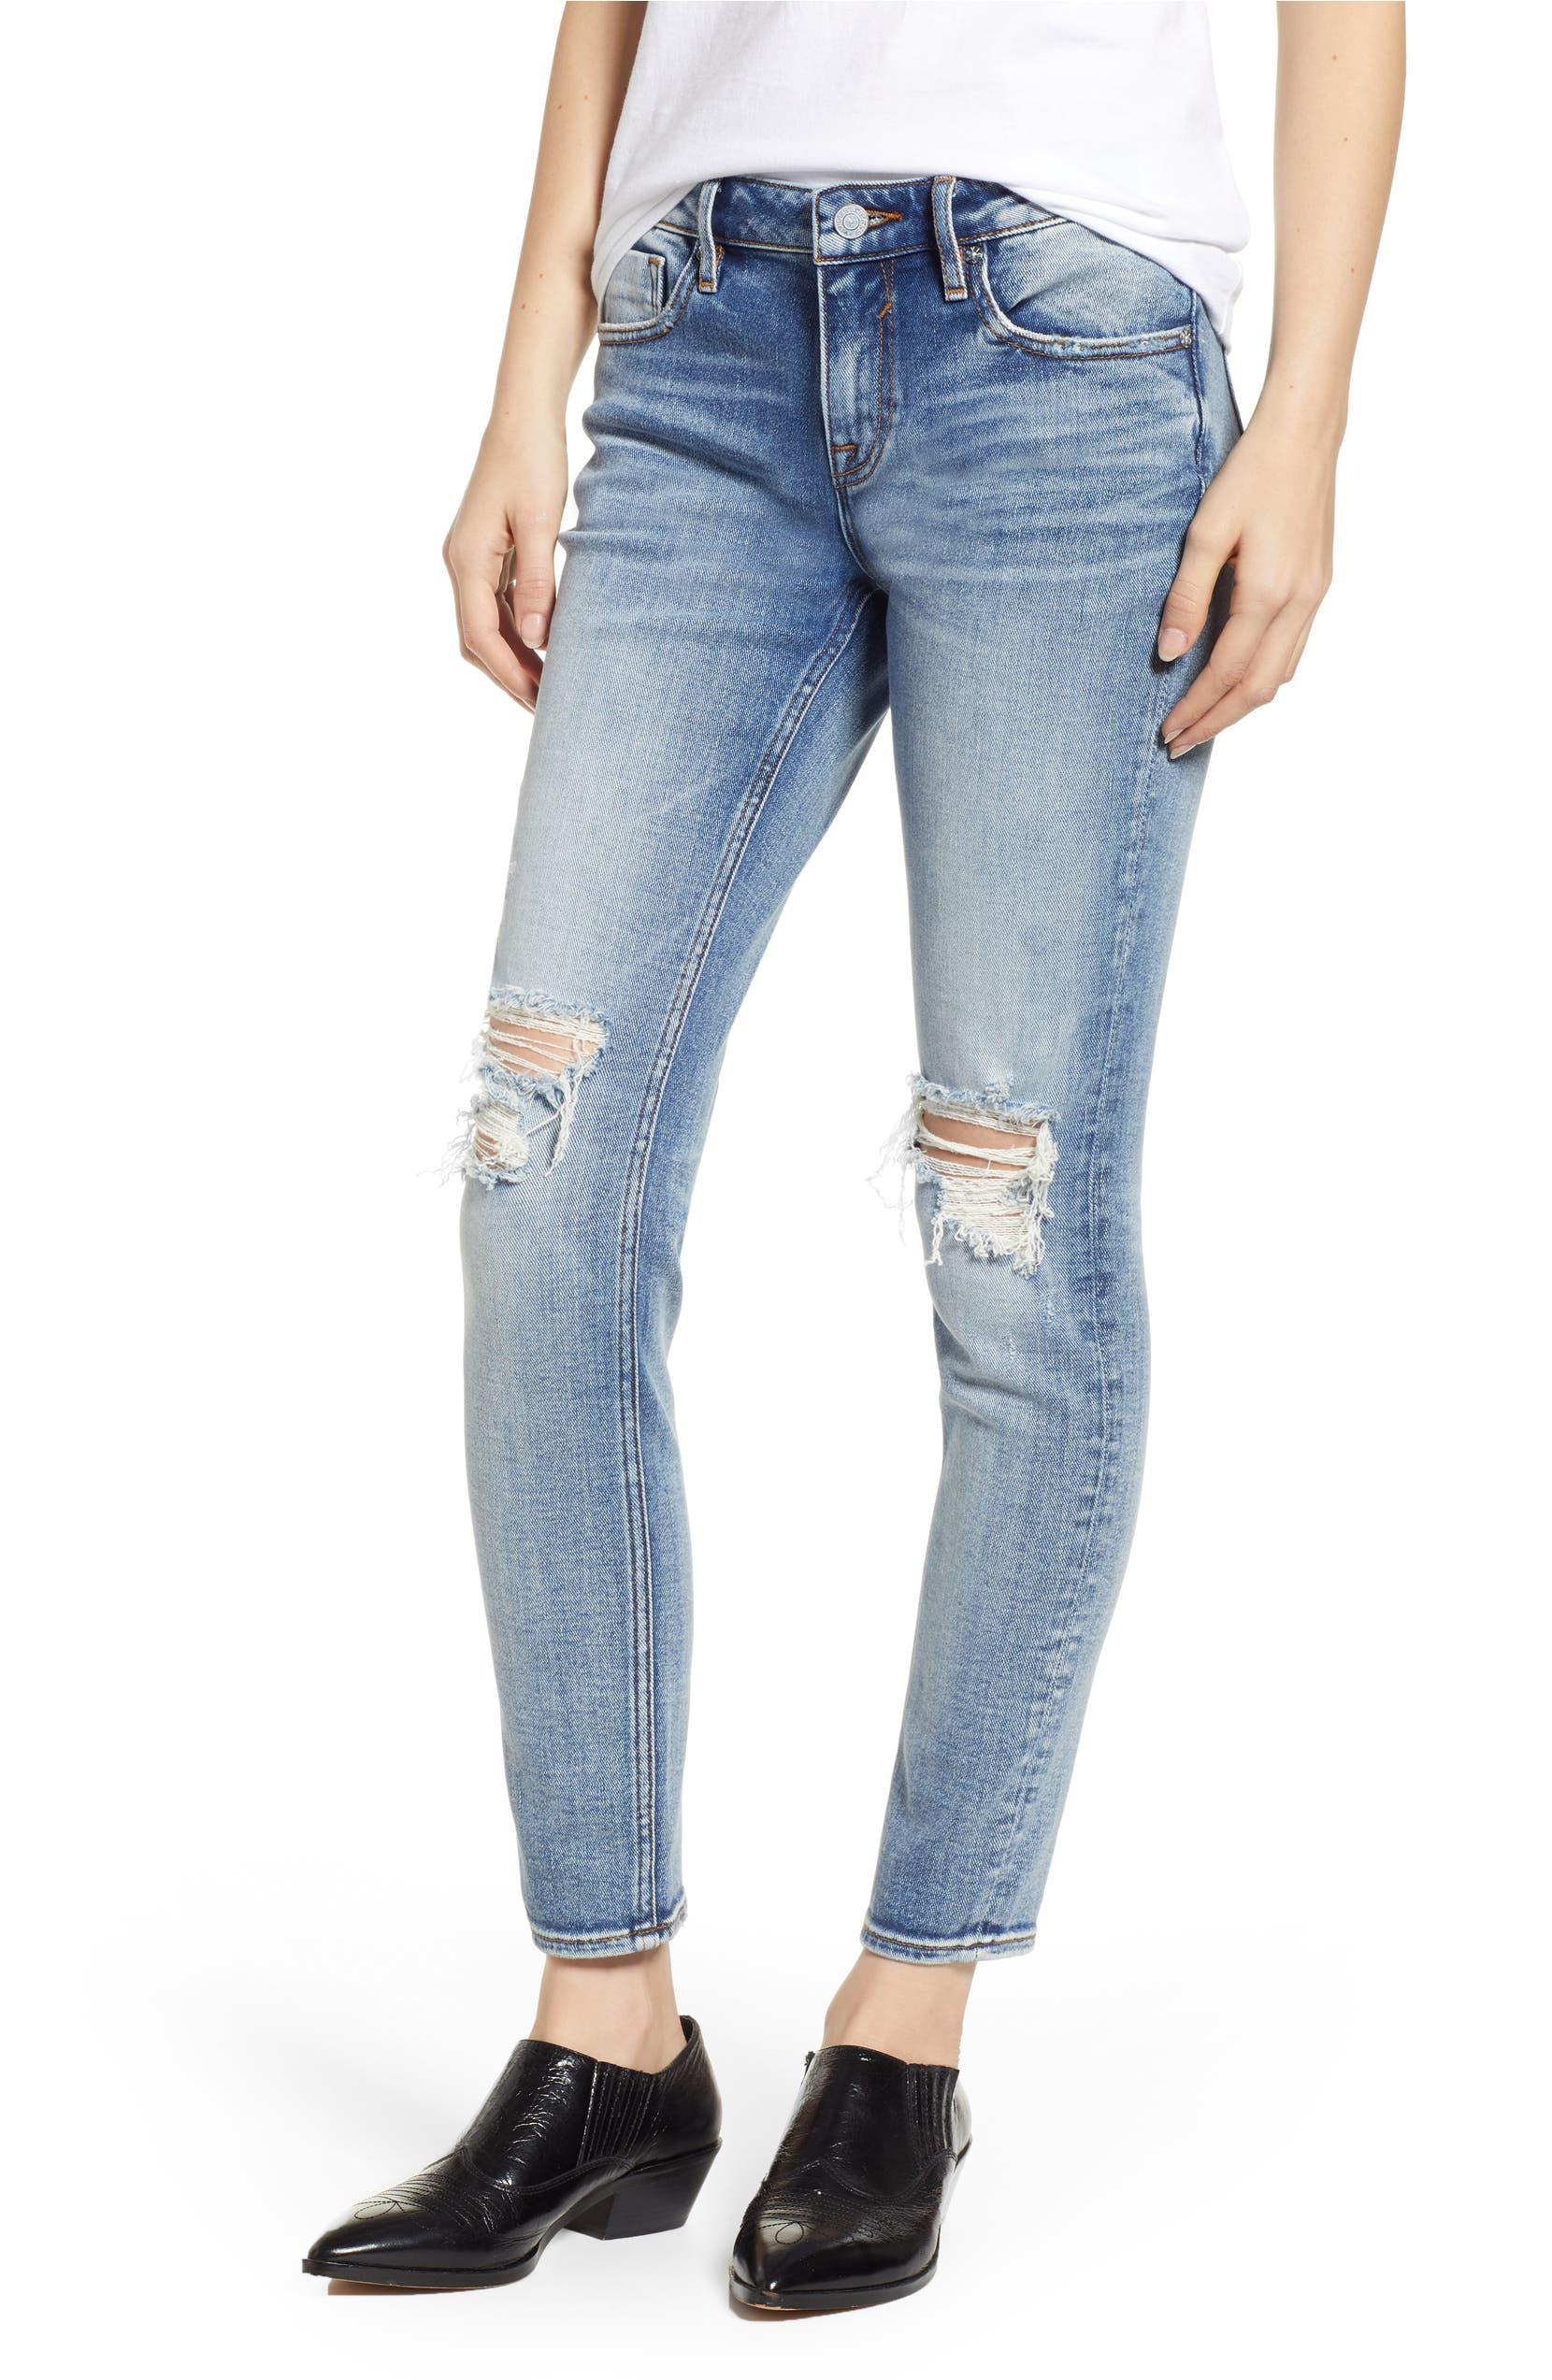 baa7ad9e597 Vigoss Jagger Ripped Skinny Jeans